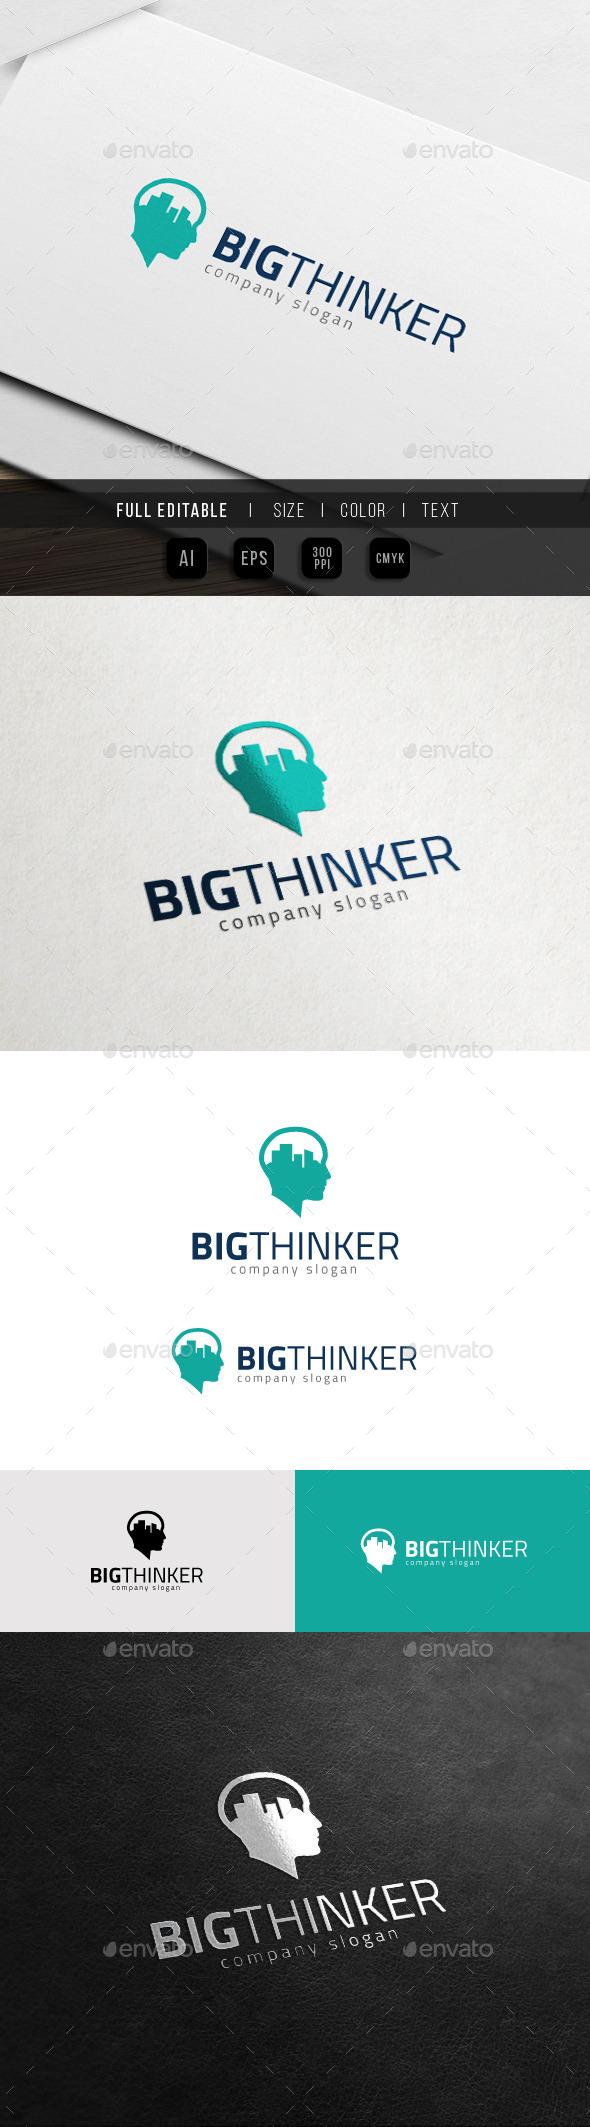 GraphicRiver Big City Idea Vision Thinker Logo 11427542